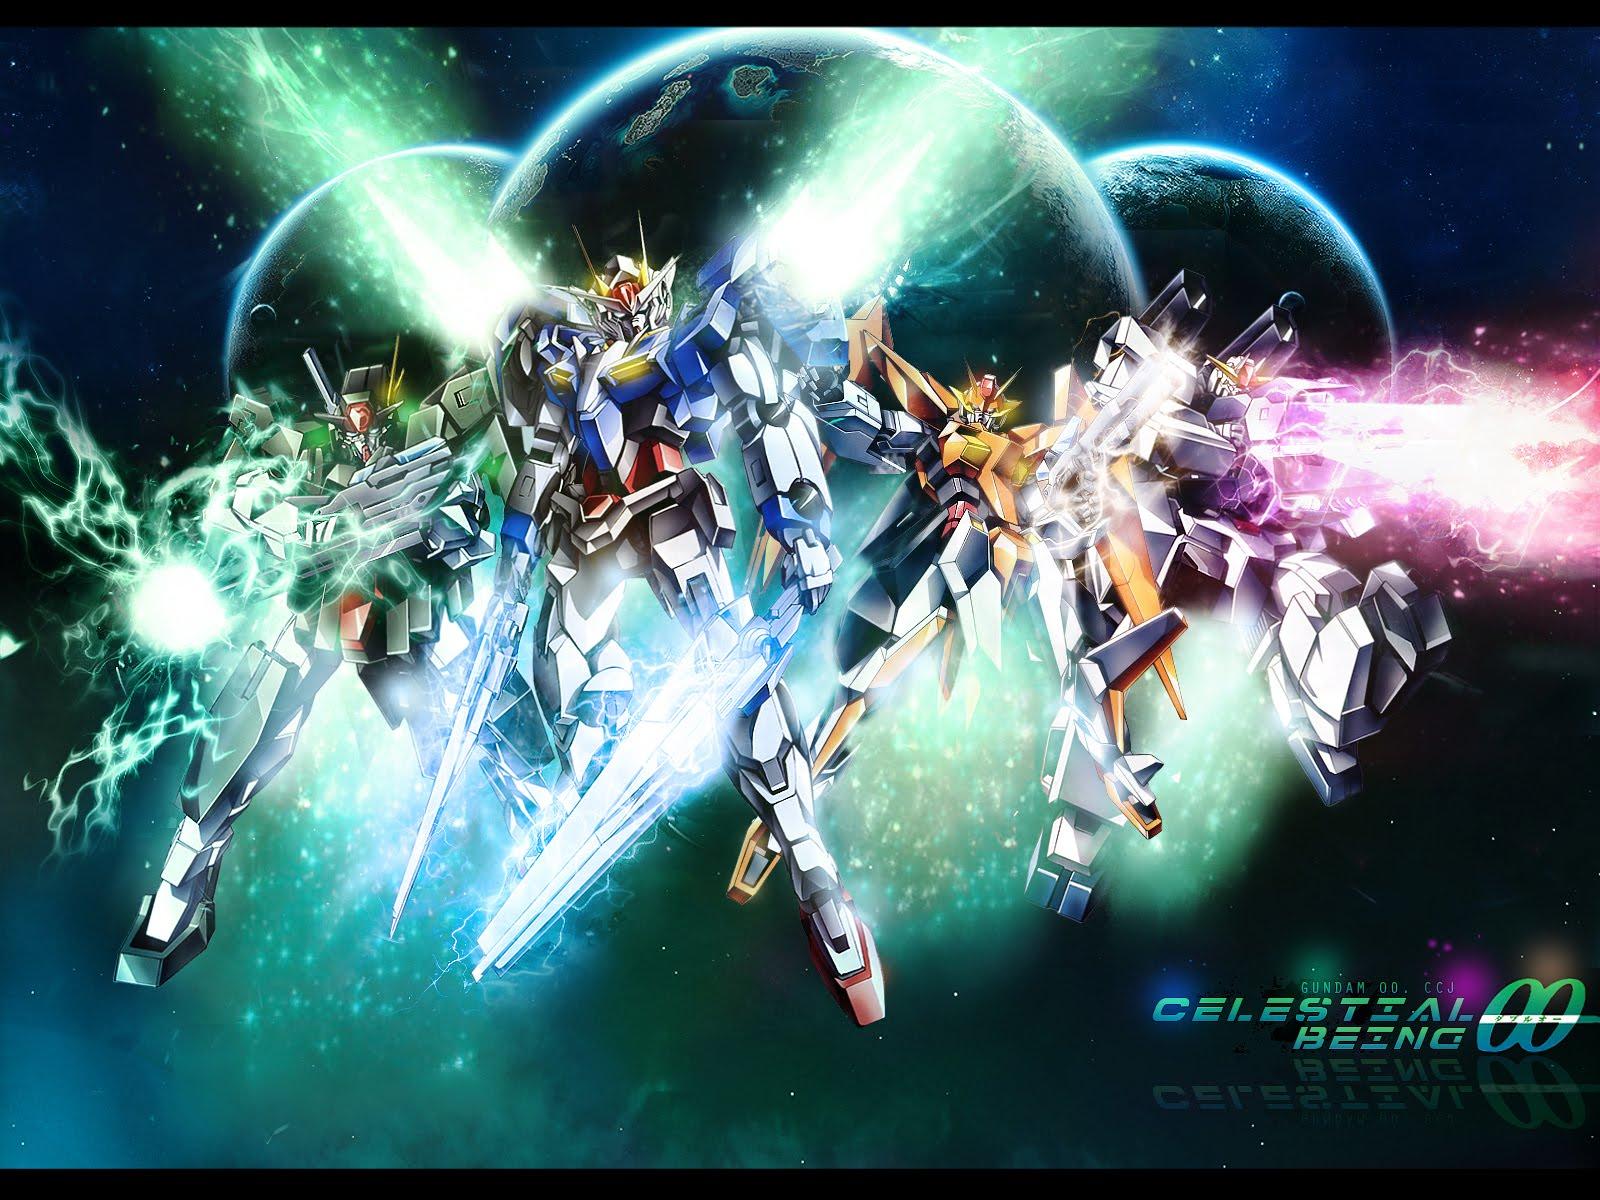 http://1.bp.blogspot.com/_gw-XJ7nQGbA/S9M07QVKK1I/AAAAAAAAACM/fFEB3_esA7c/s1600/Gundam_00_Wallpaper_2_by_CCJ.jpg